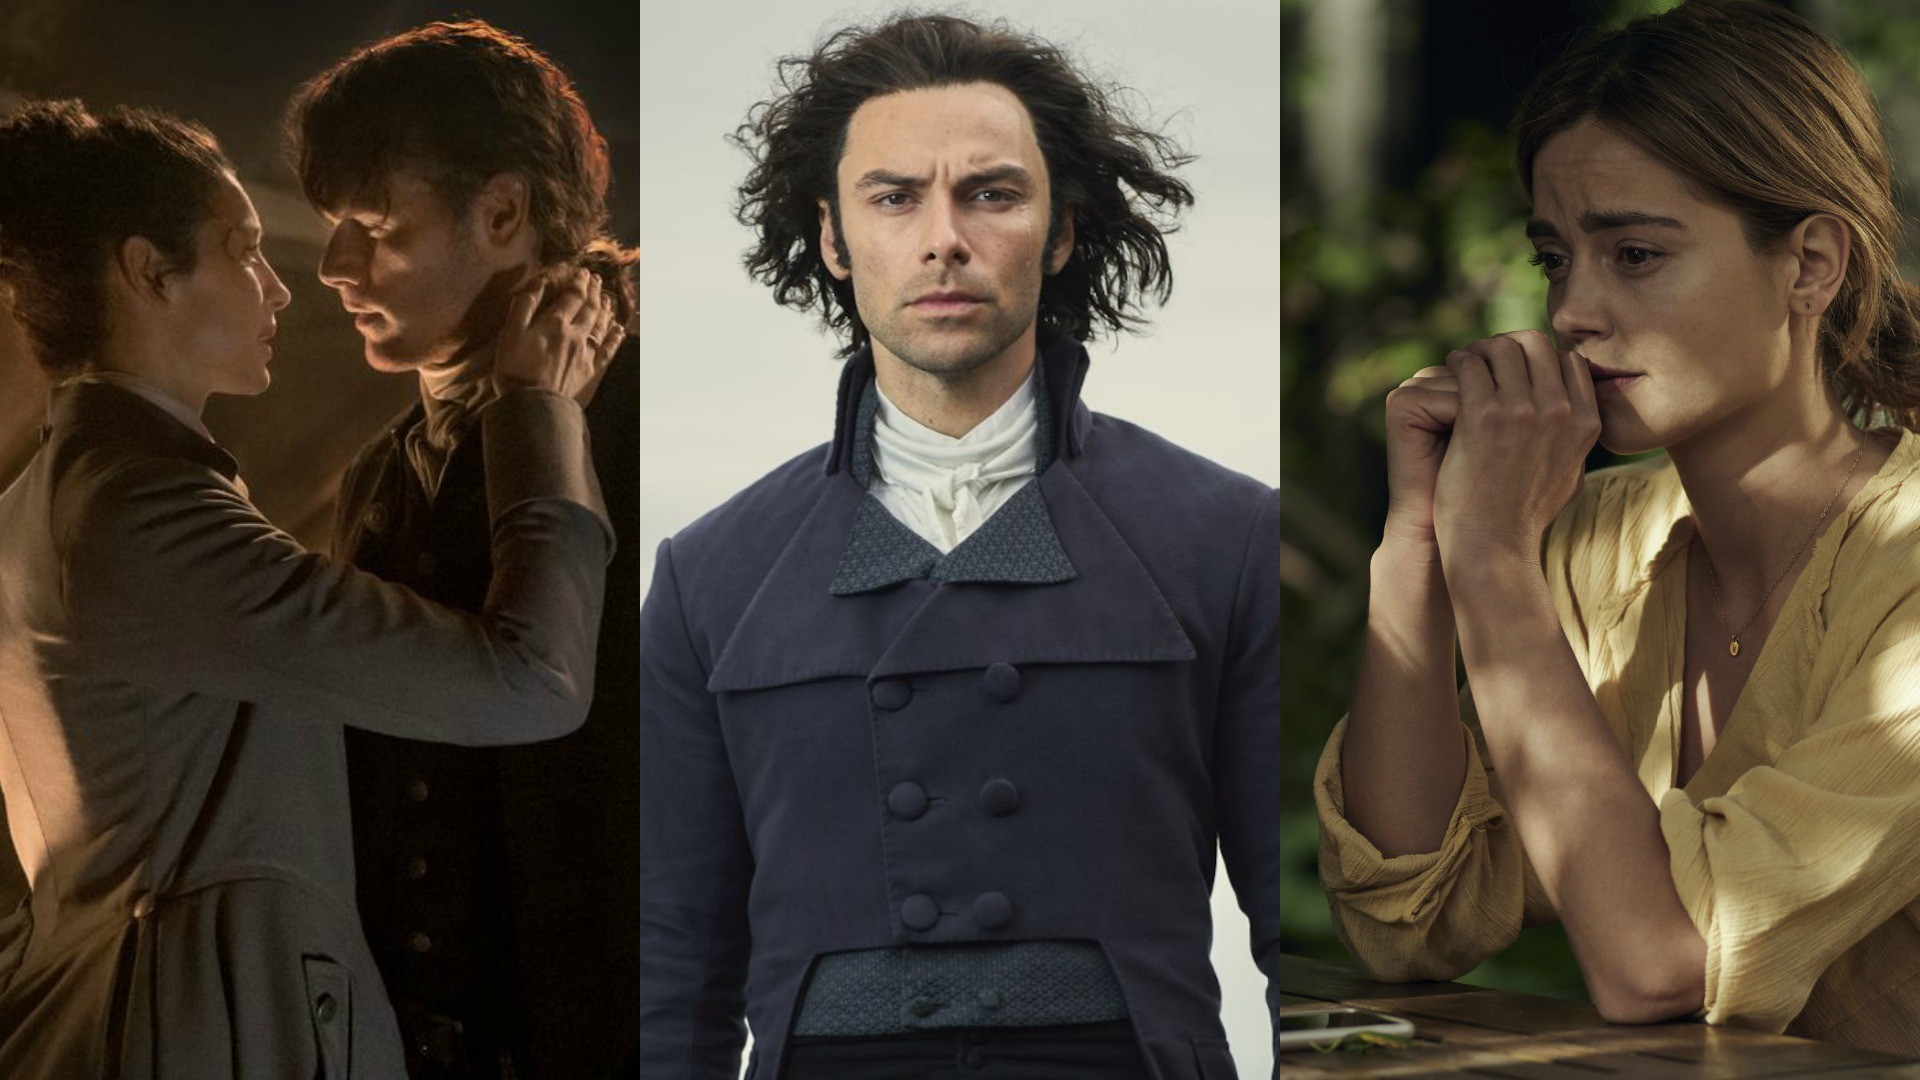 2018 Dramas Poldark Outlander and The Cry